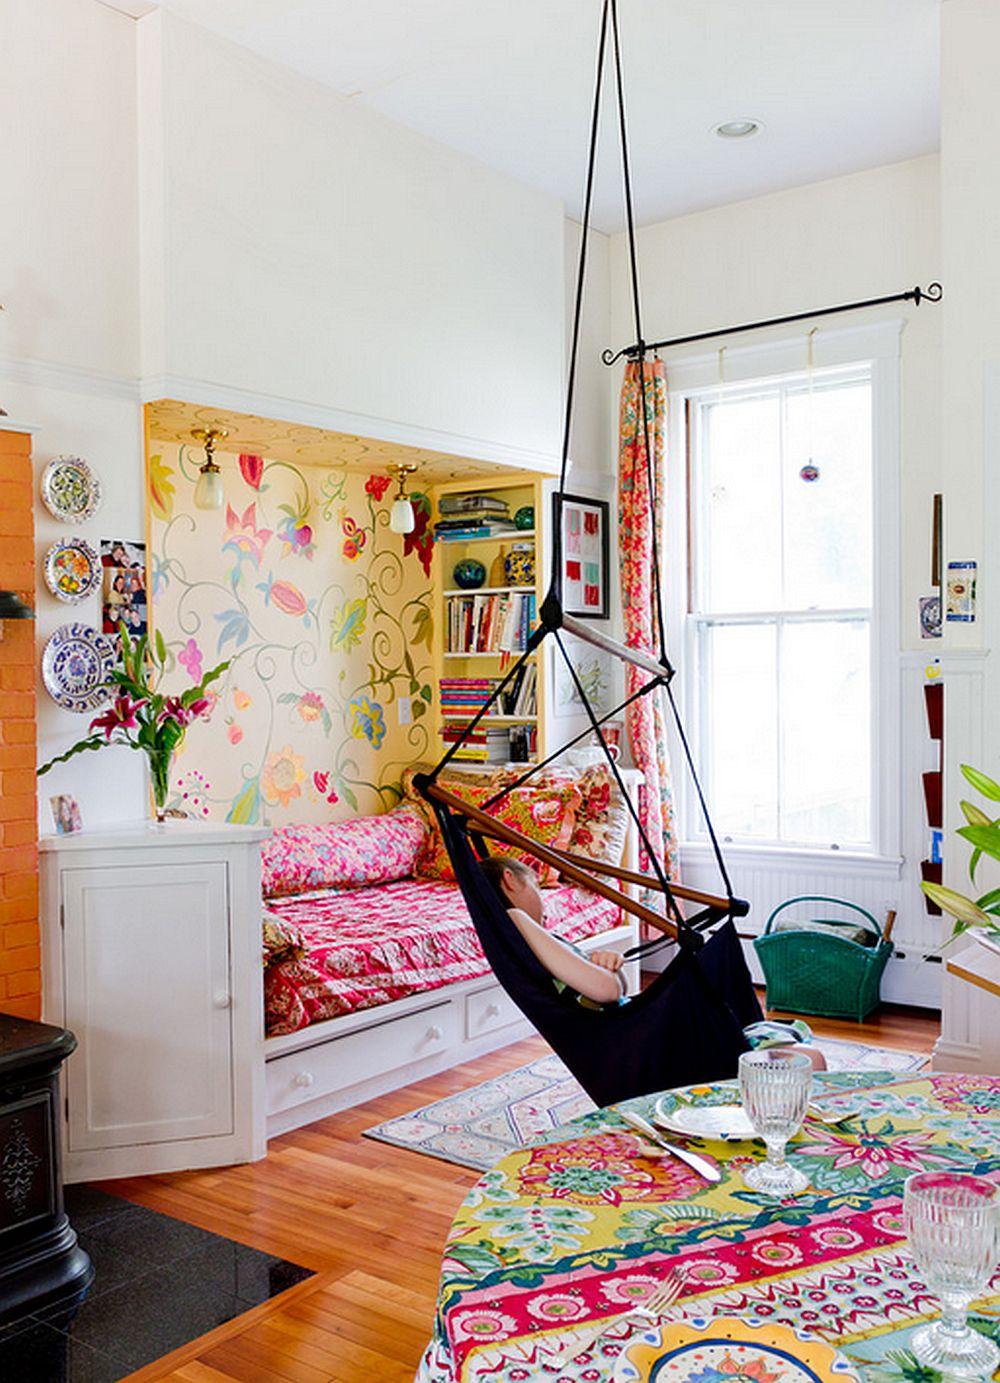 adelaparvu.com despre casa veche de artisti din Boston cu pereti pictati cu flori, Foto Rikki Snyder (5)